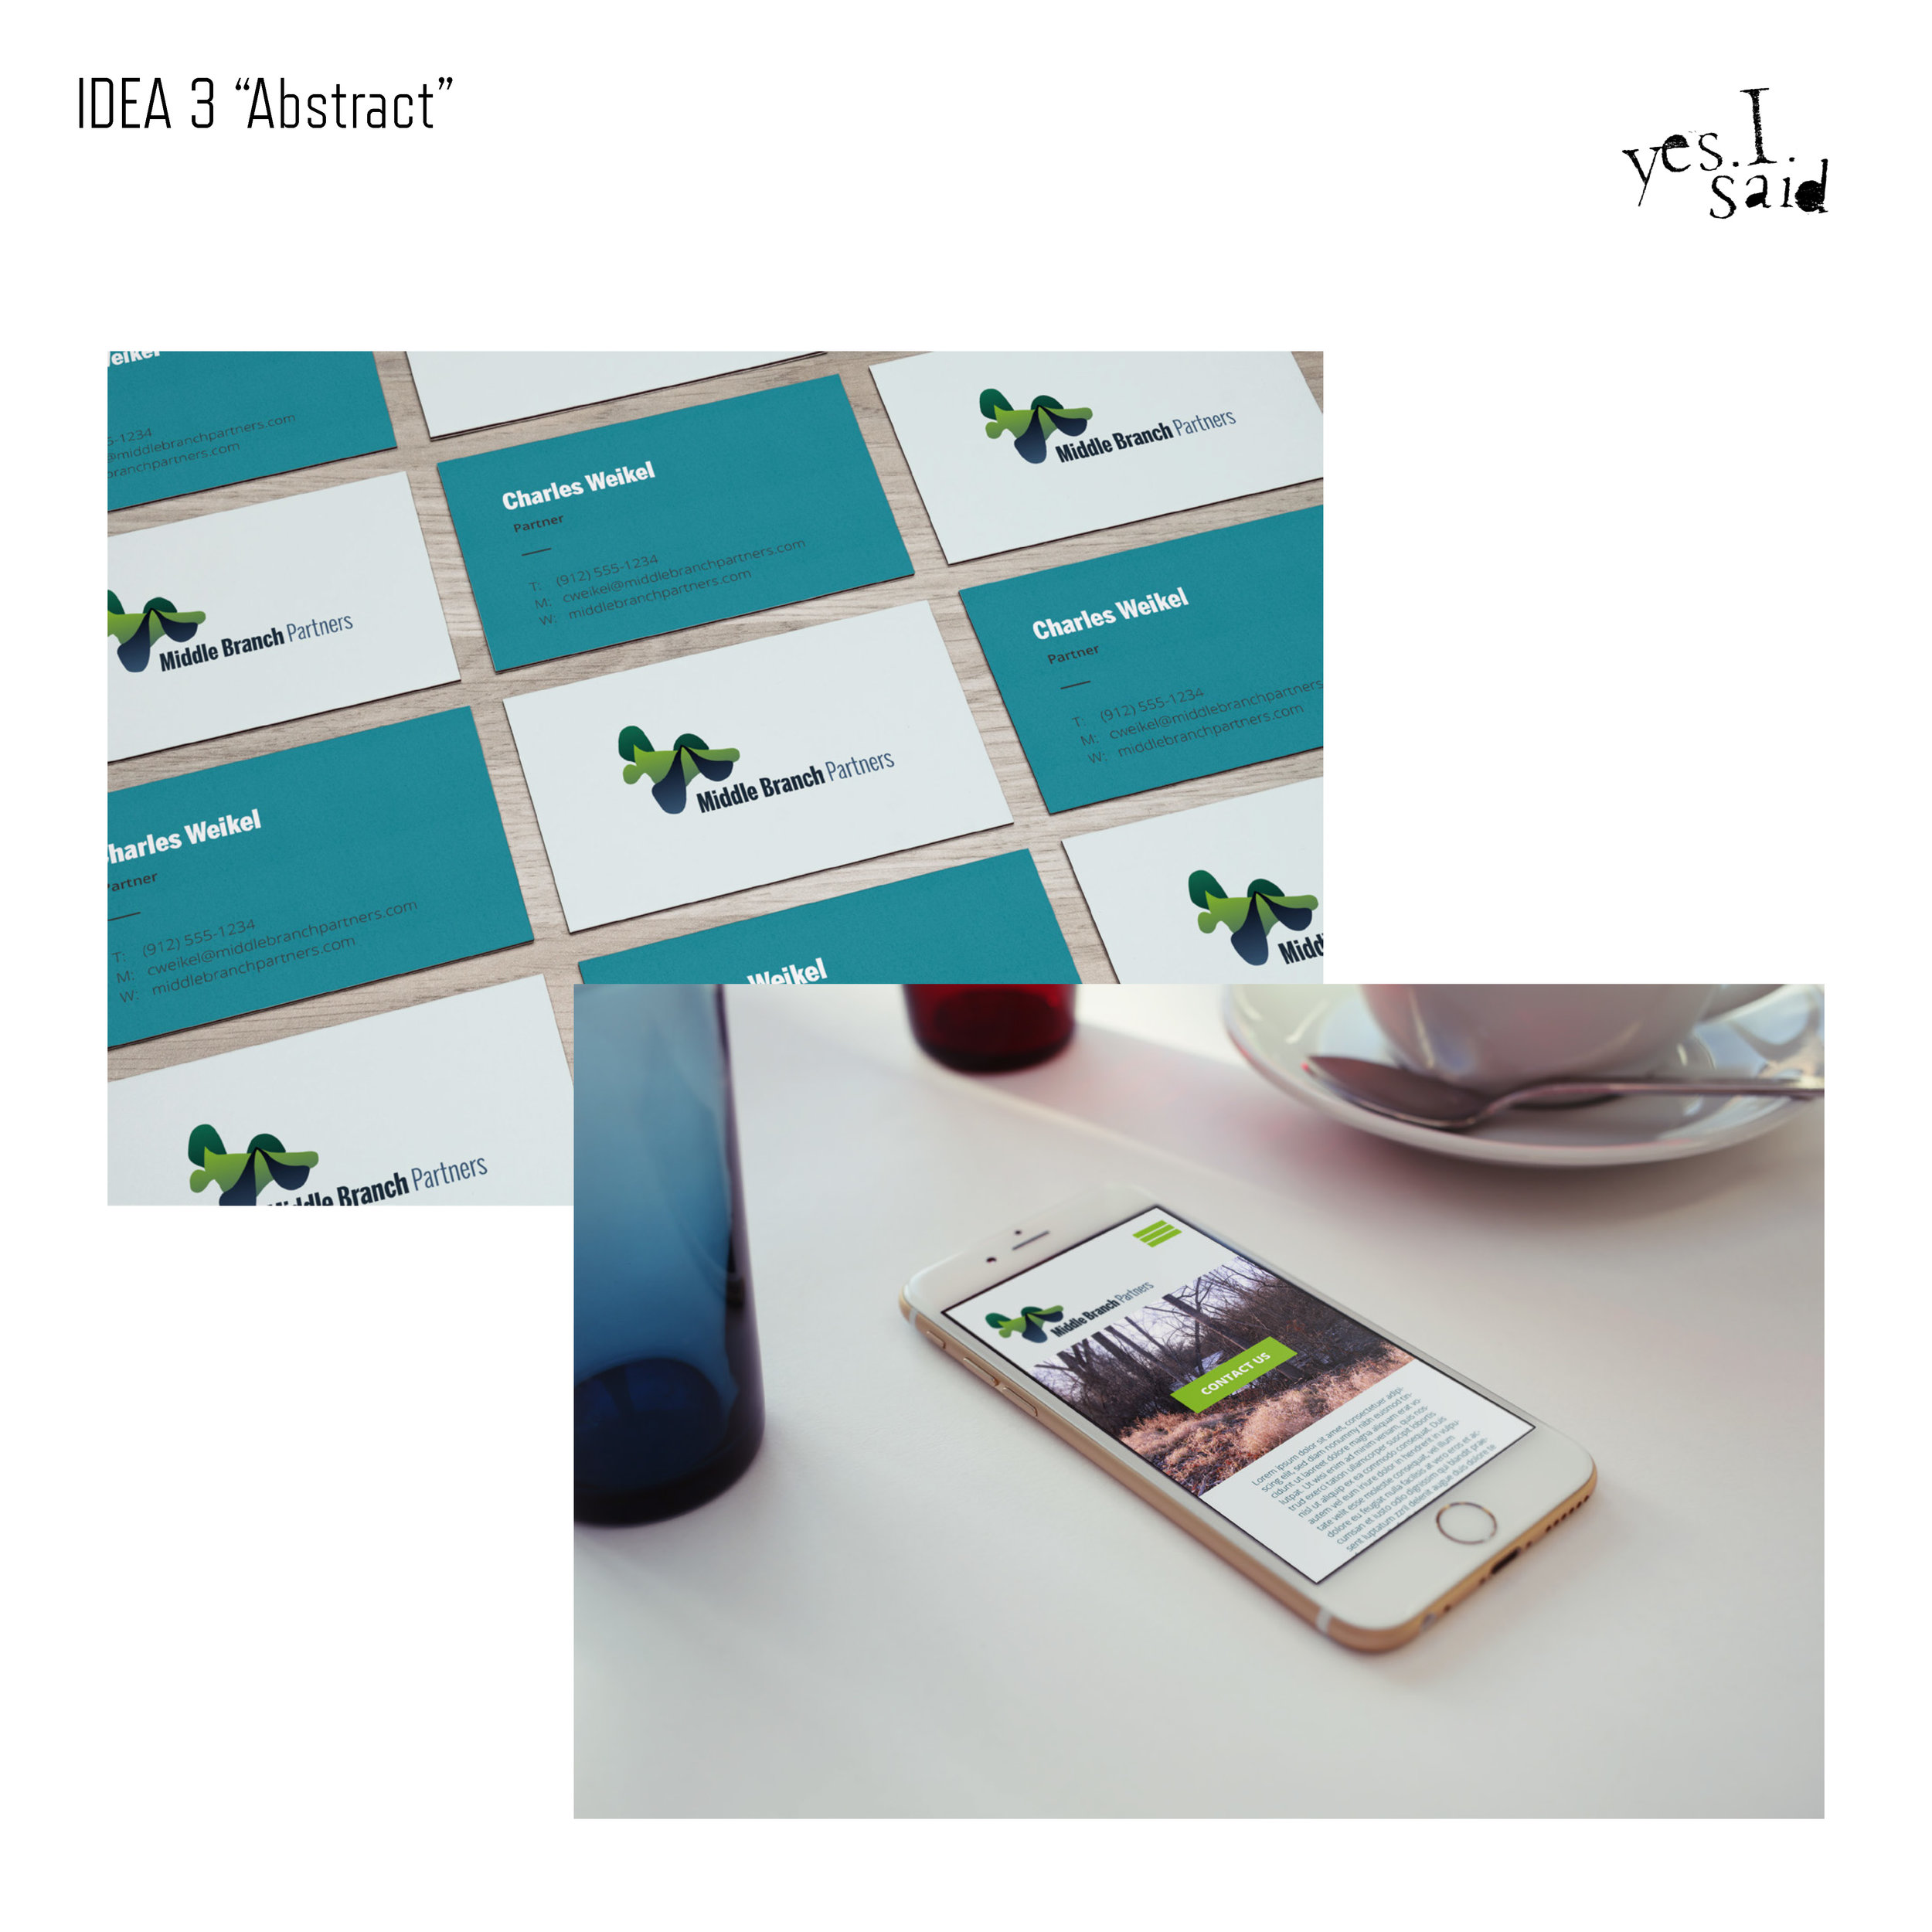 MBP-logoproposal-011119(R)_Page_10.jpg